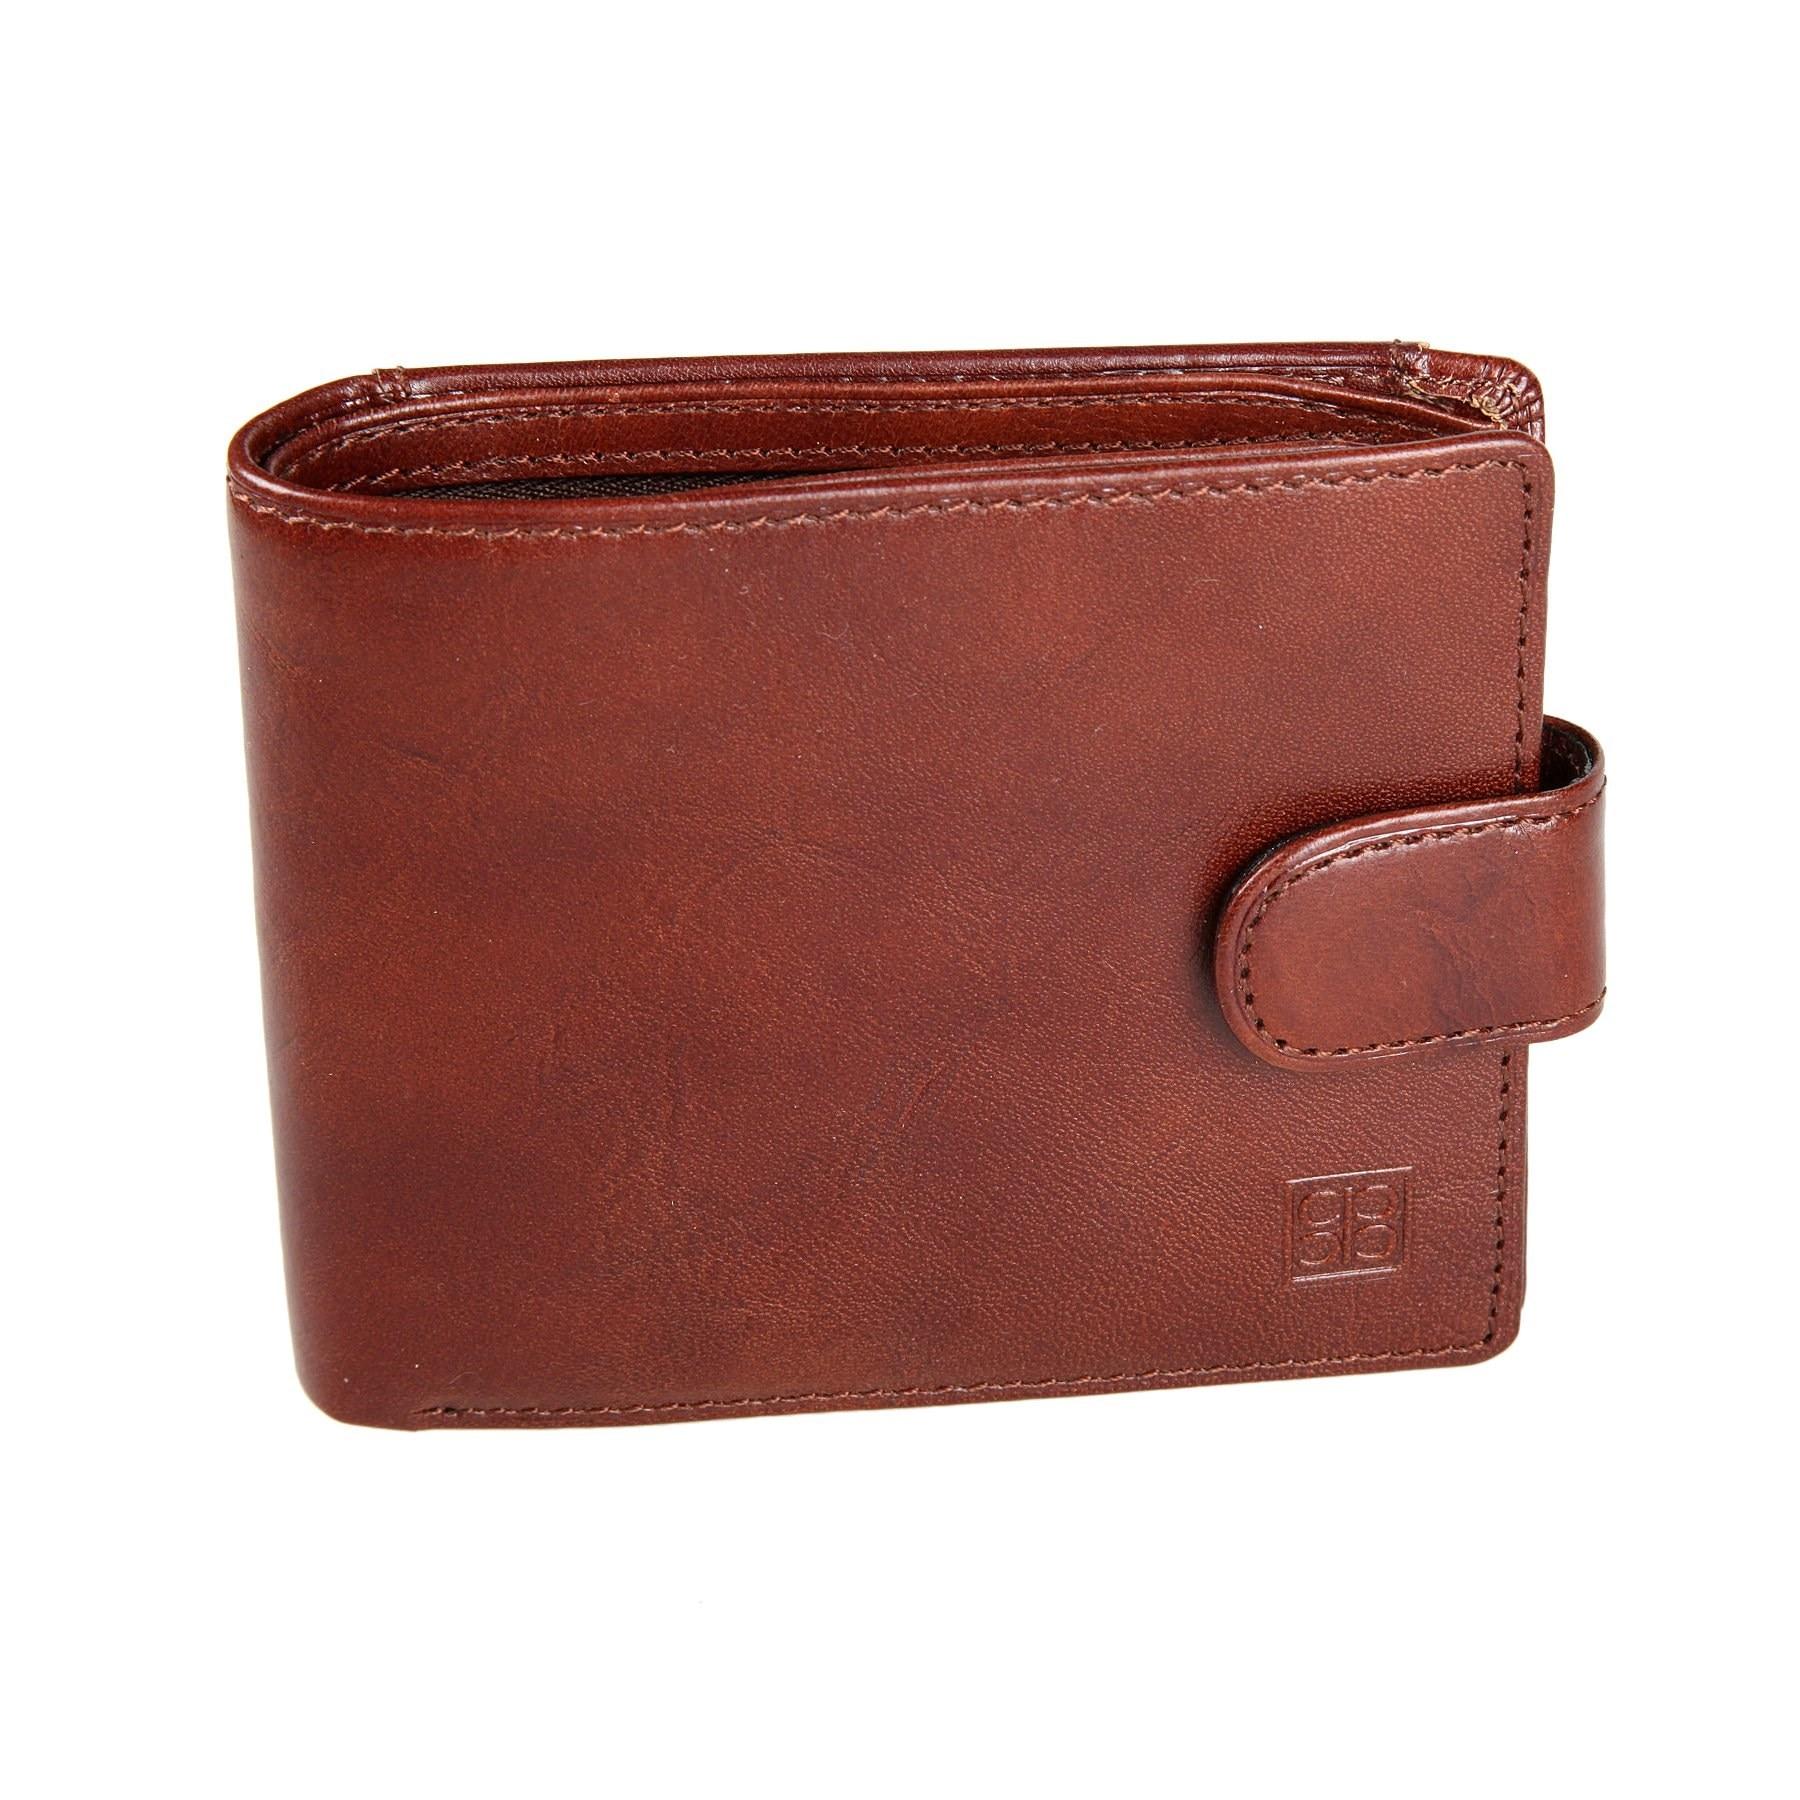 Coin Purse Sergio Belotti 2594 Milano Brown simple retro split leather coin purse w belt buckle brown